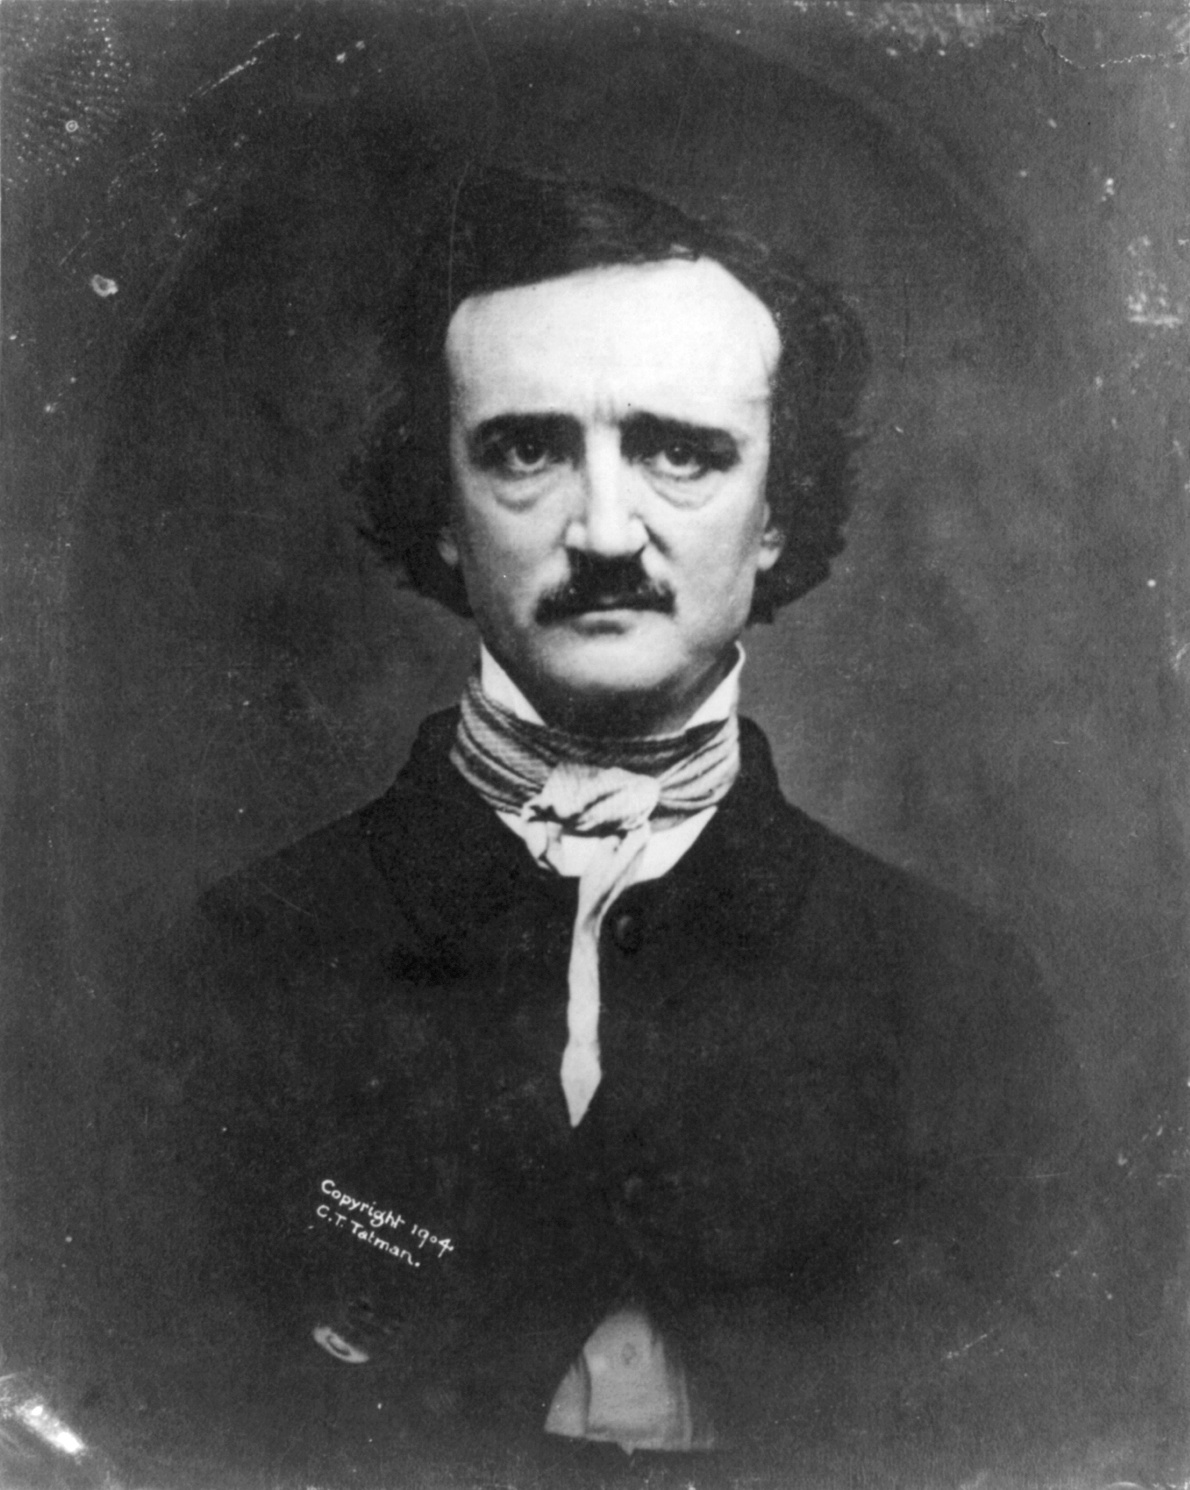 Edgar+Allan+Poe.jpg